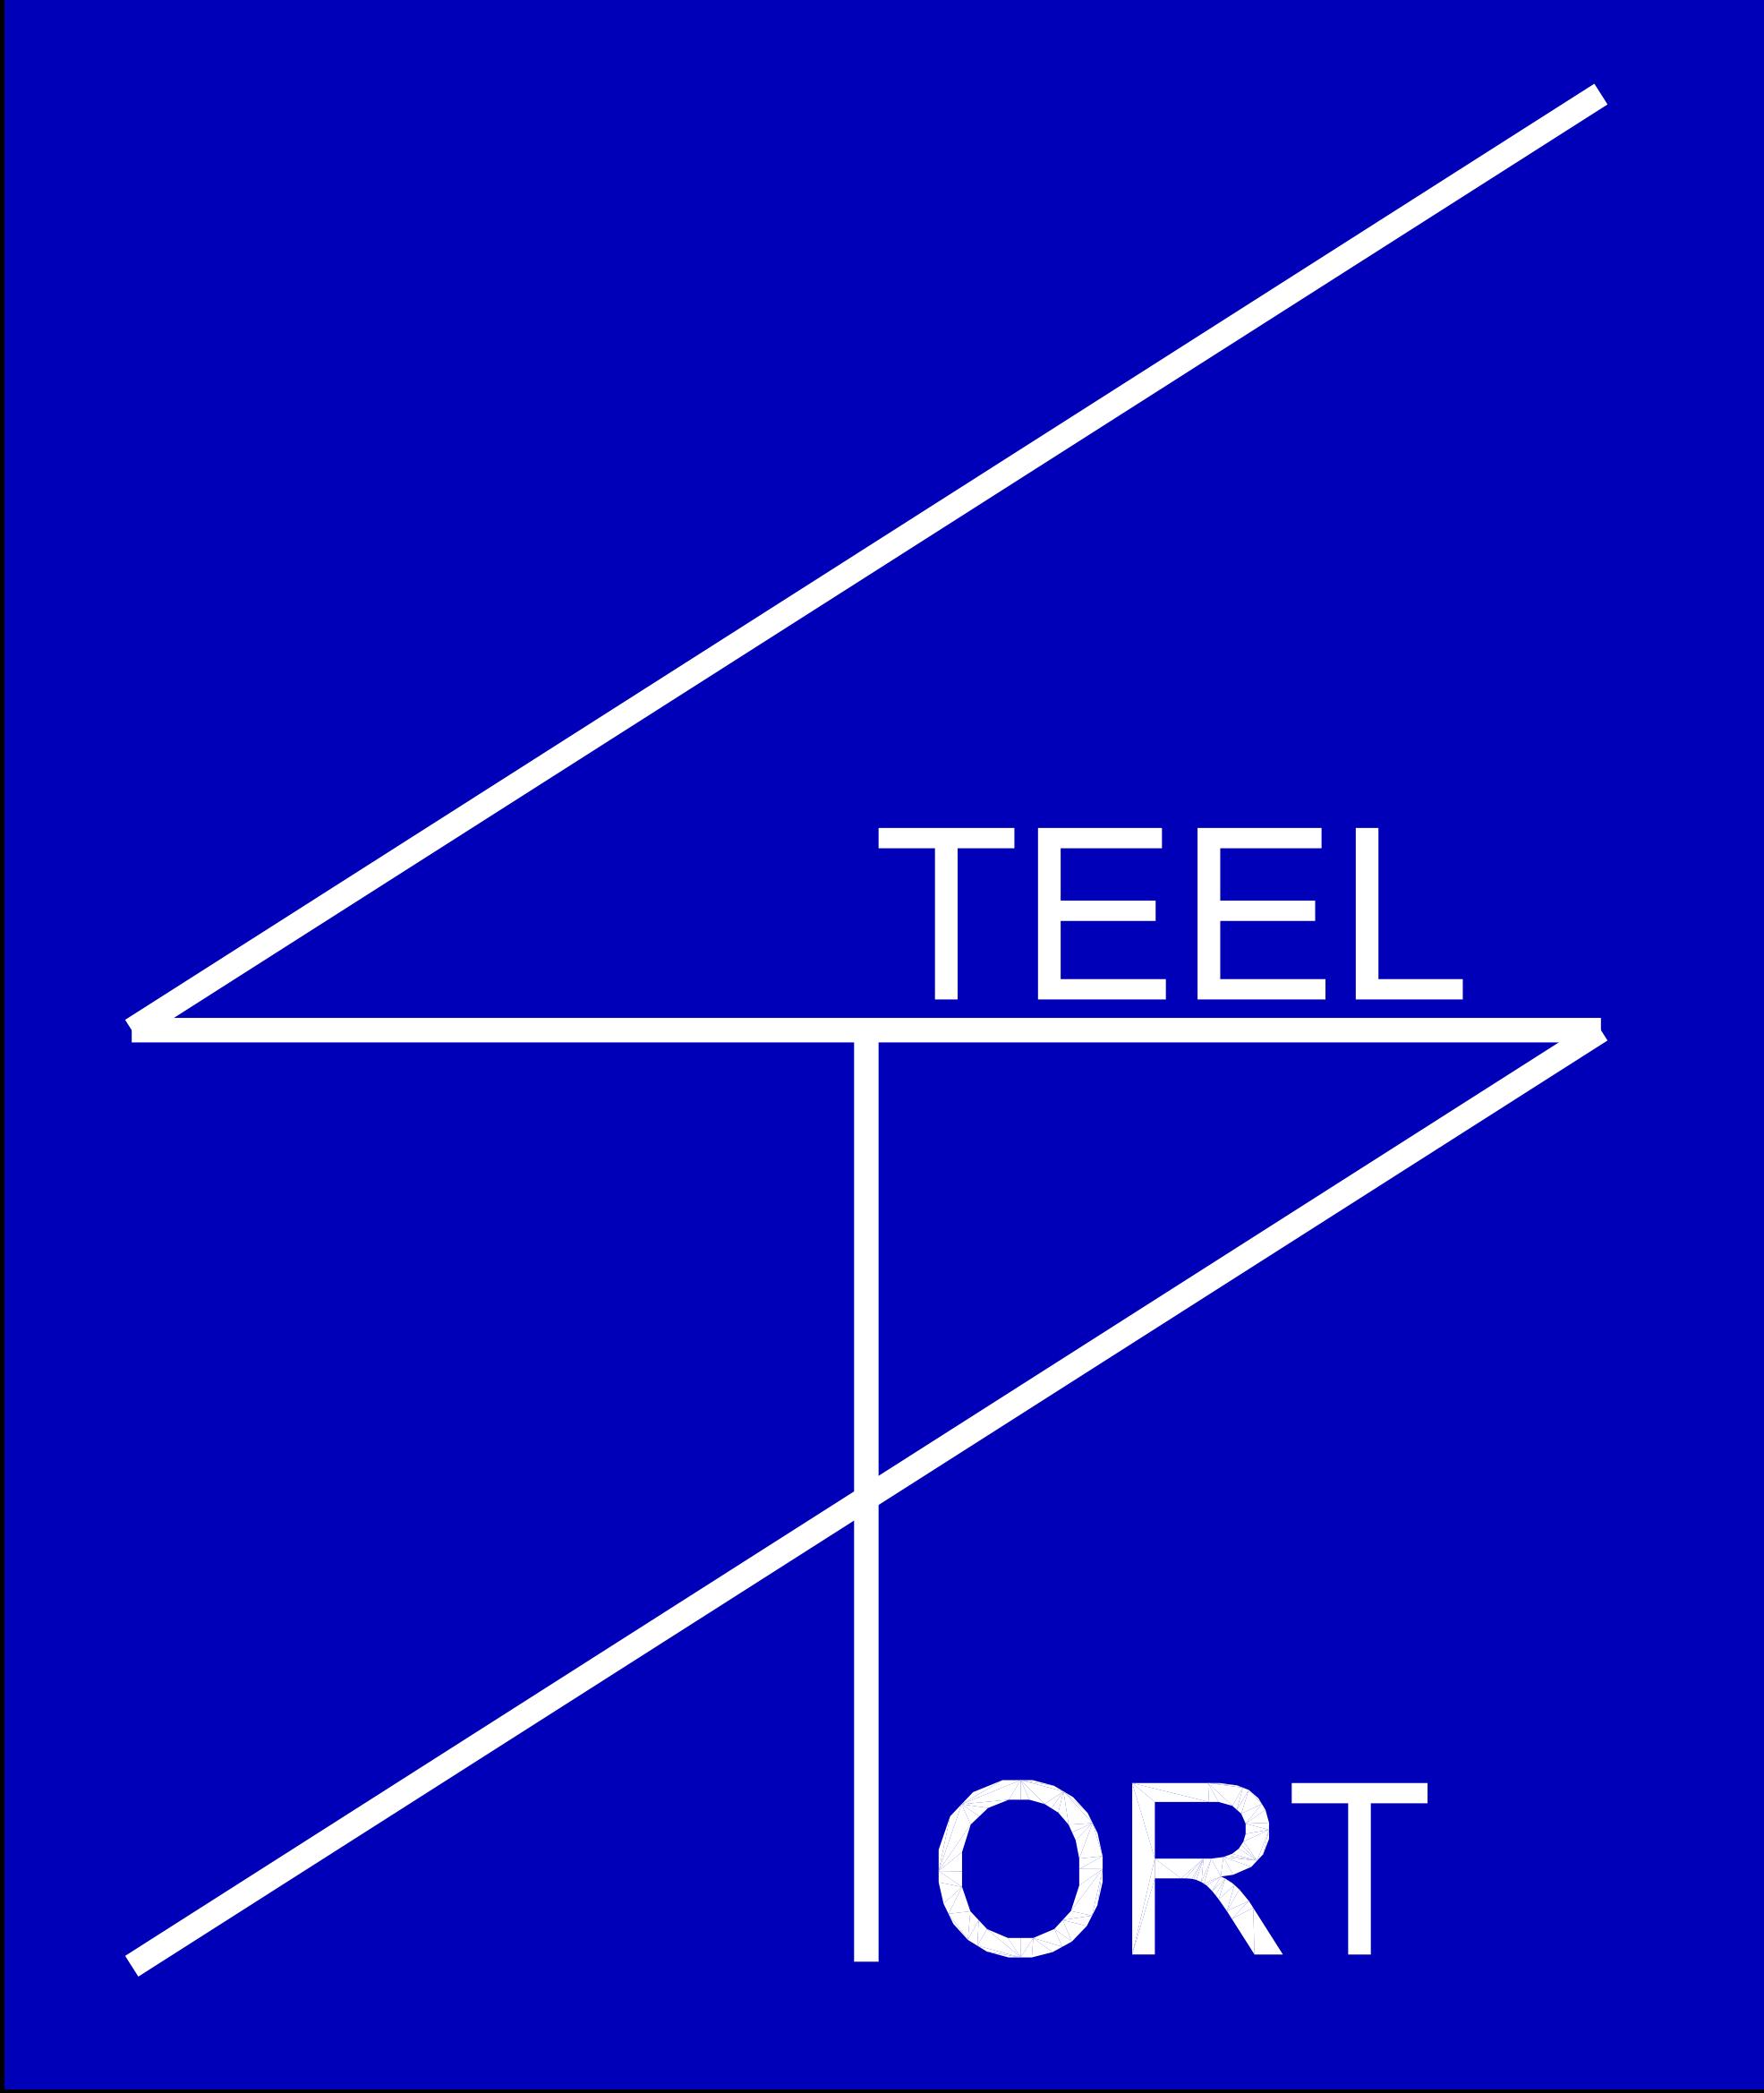 Steelport LLC